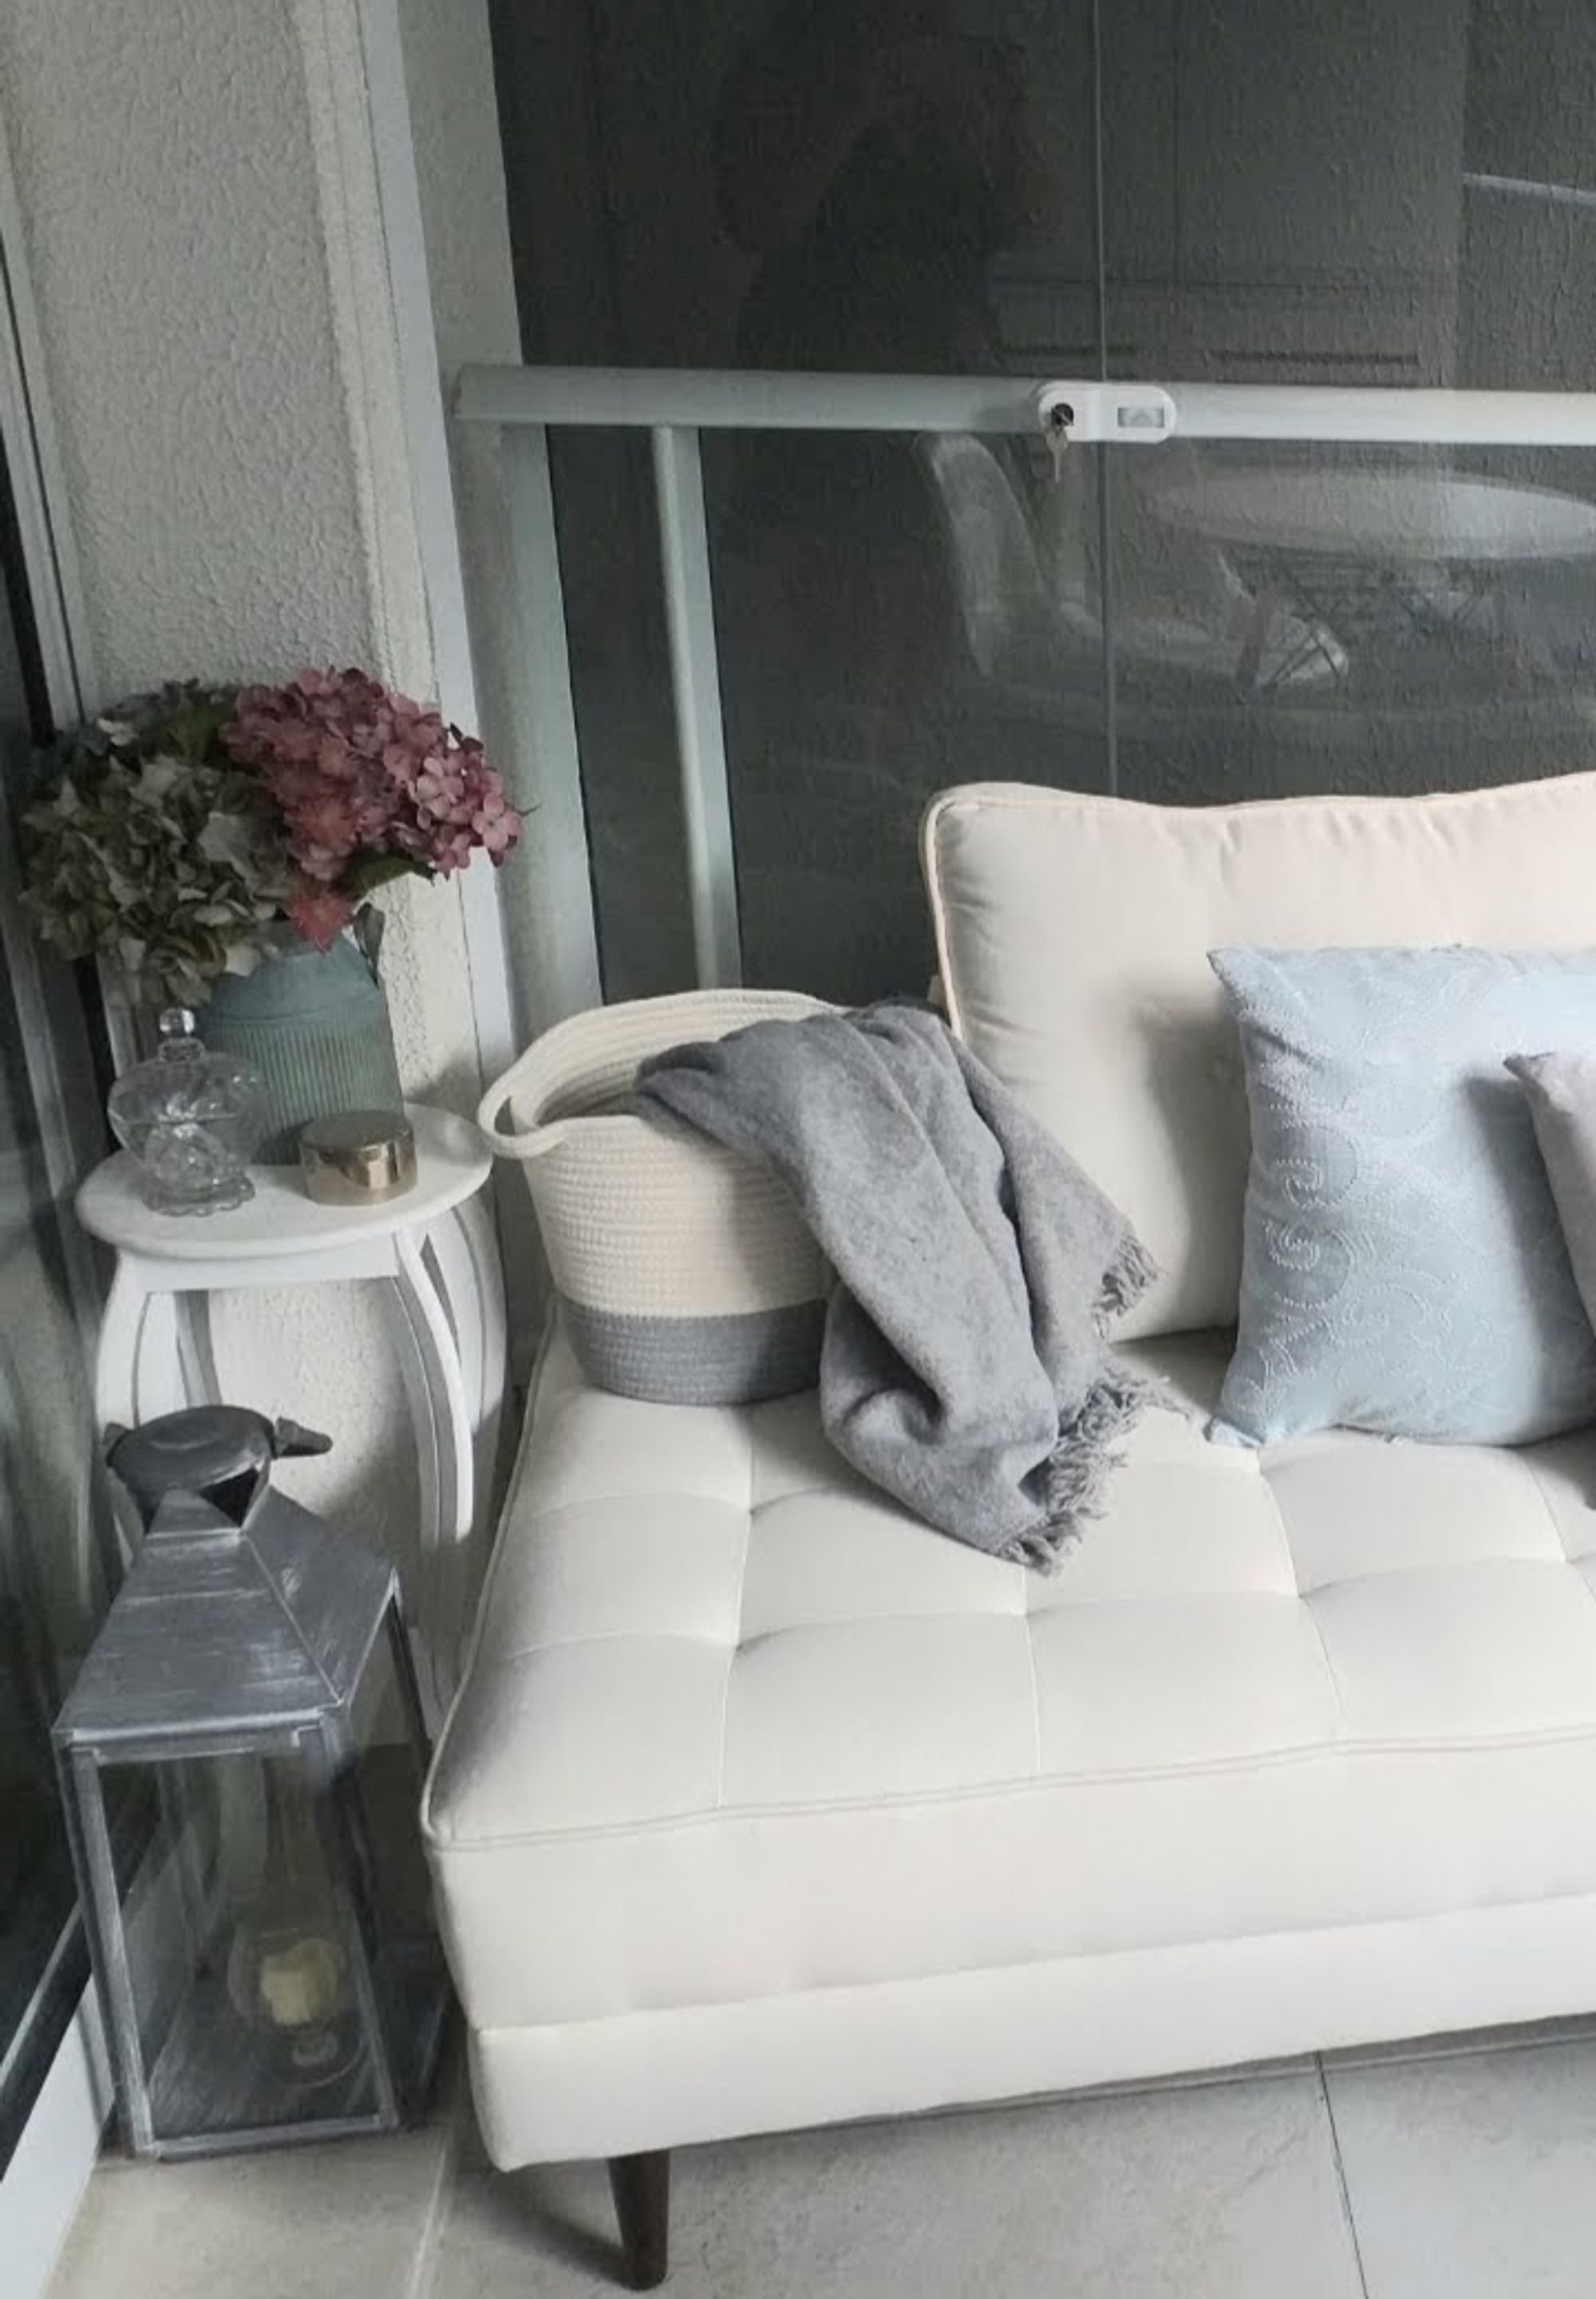 Foto de Sala com vaso de planta, cama, vaso